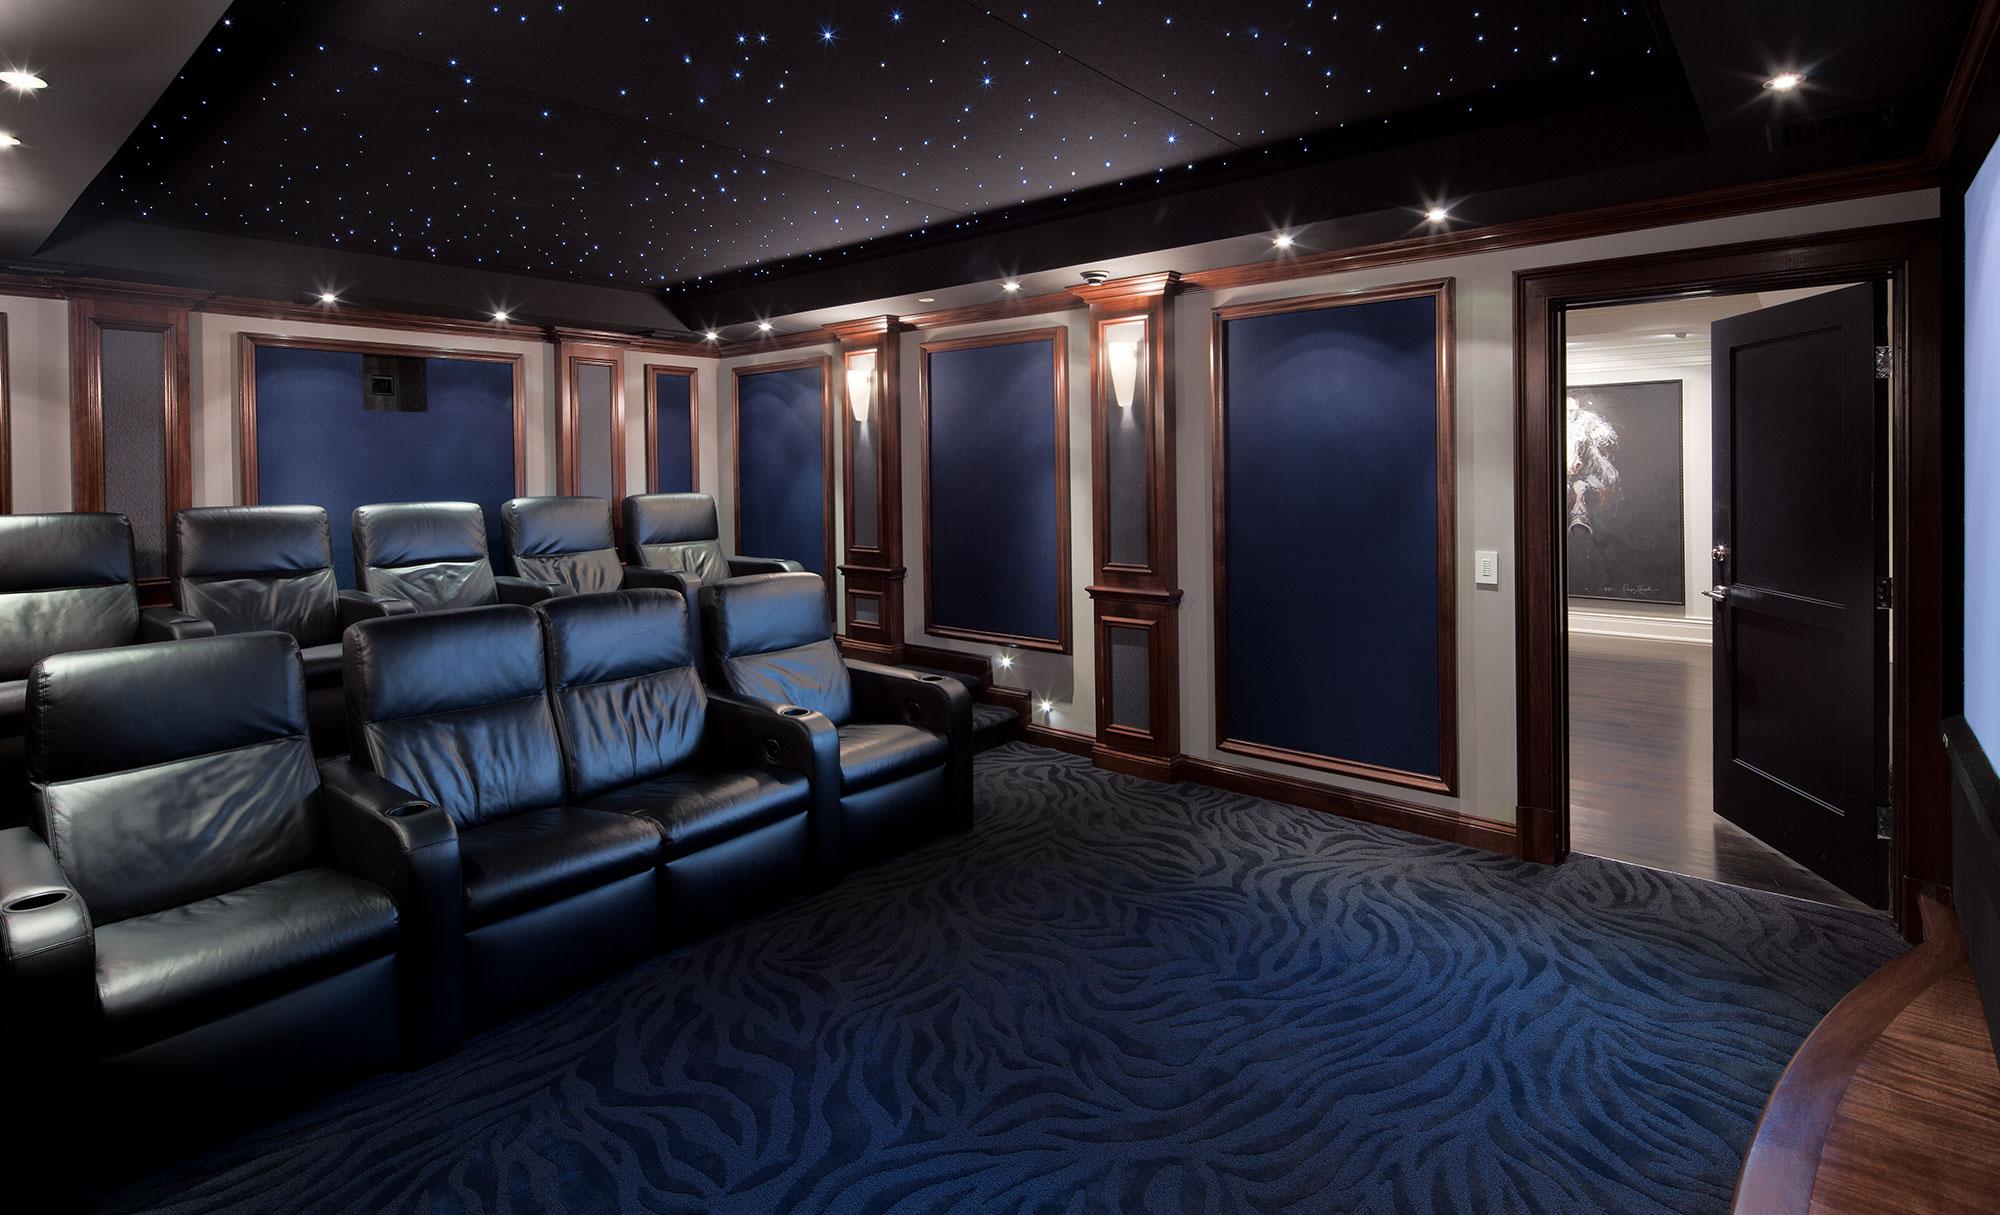 Star Lit Movie Theater